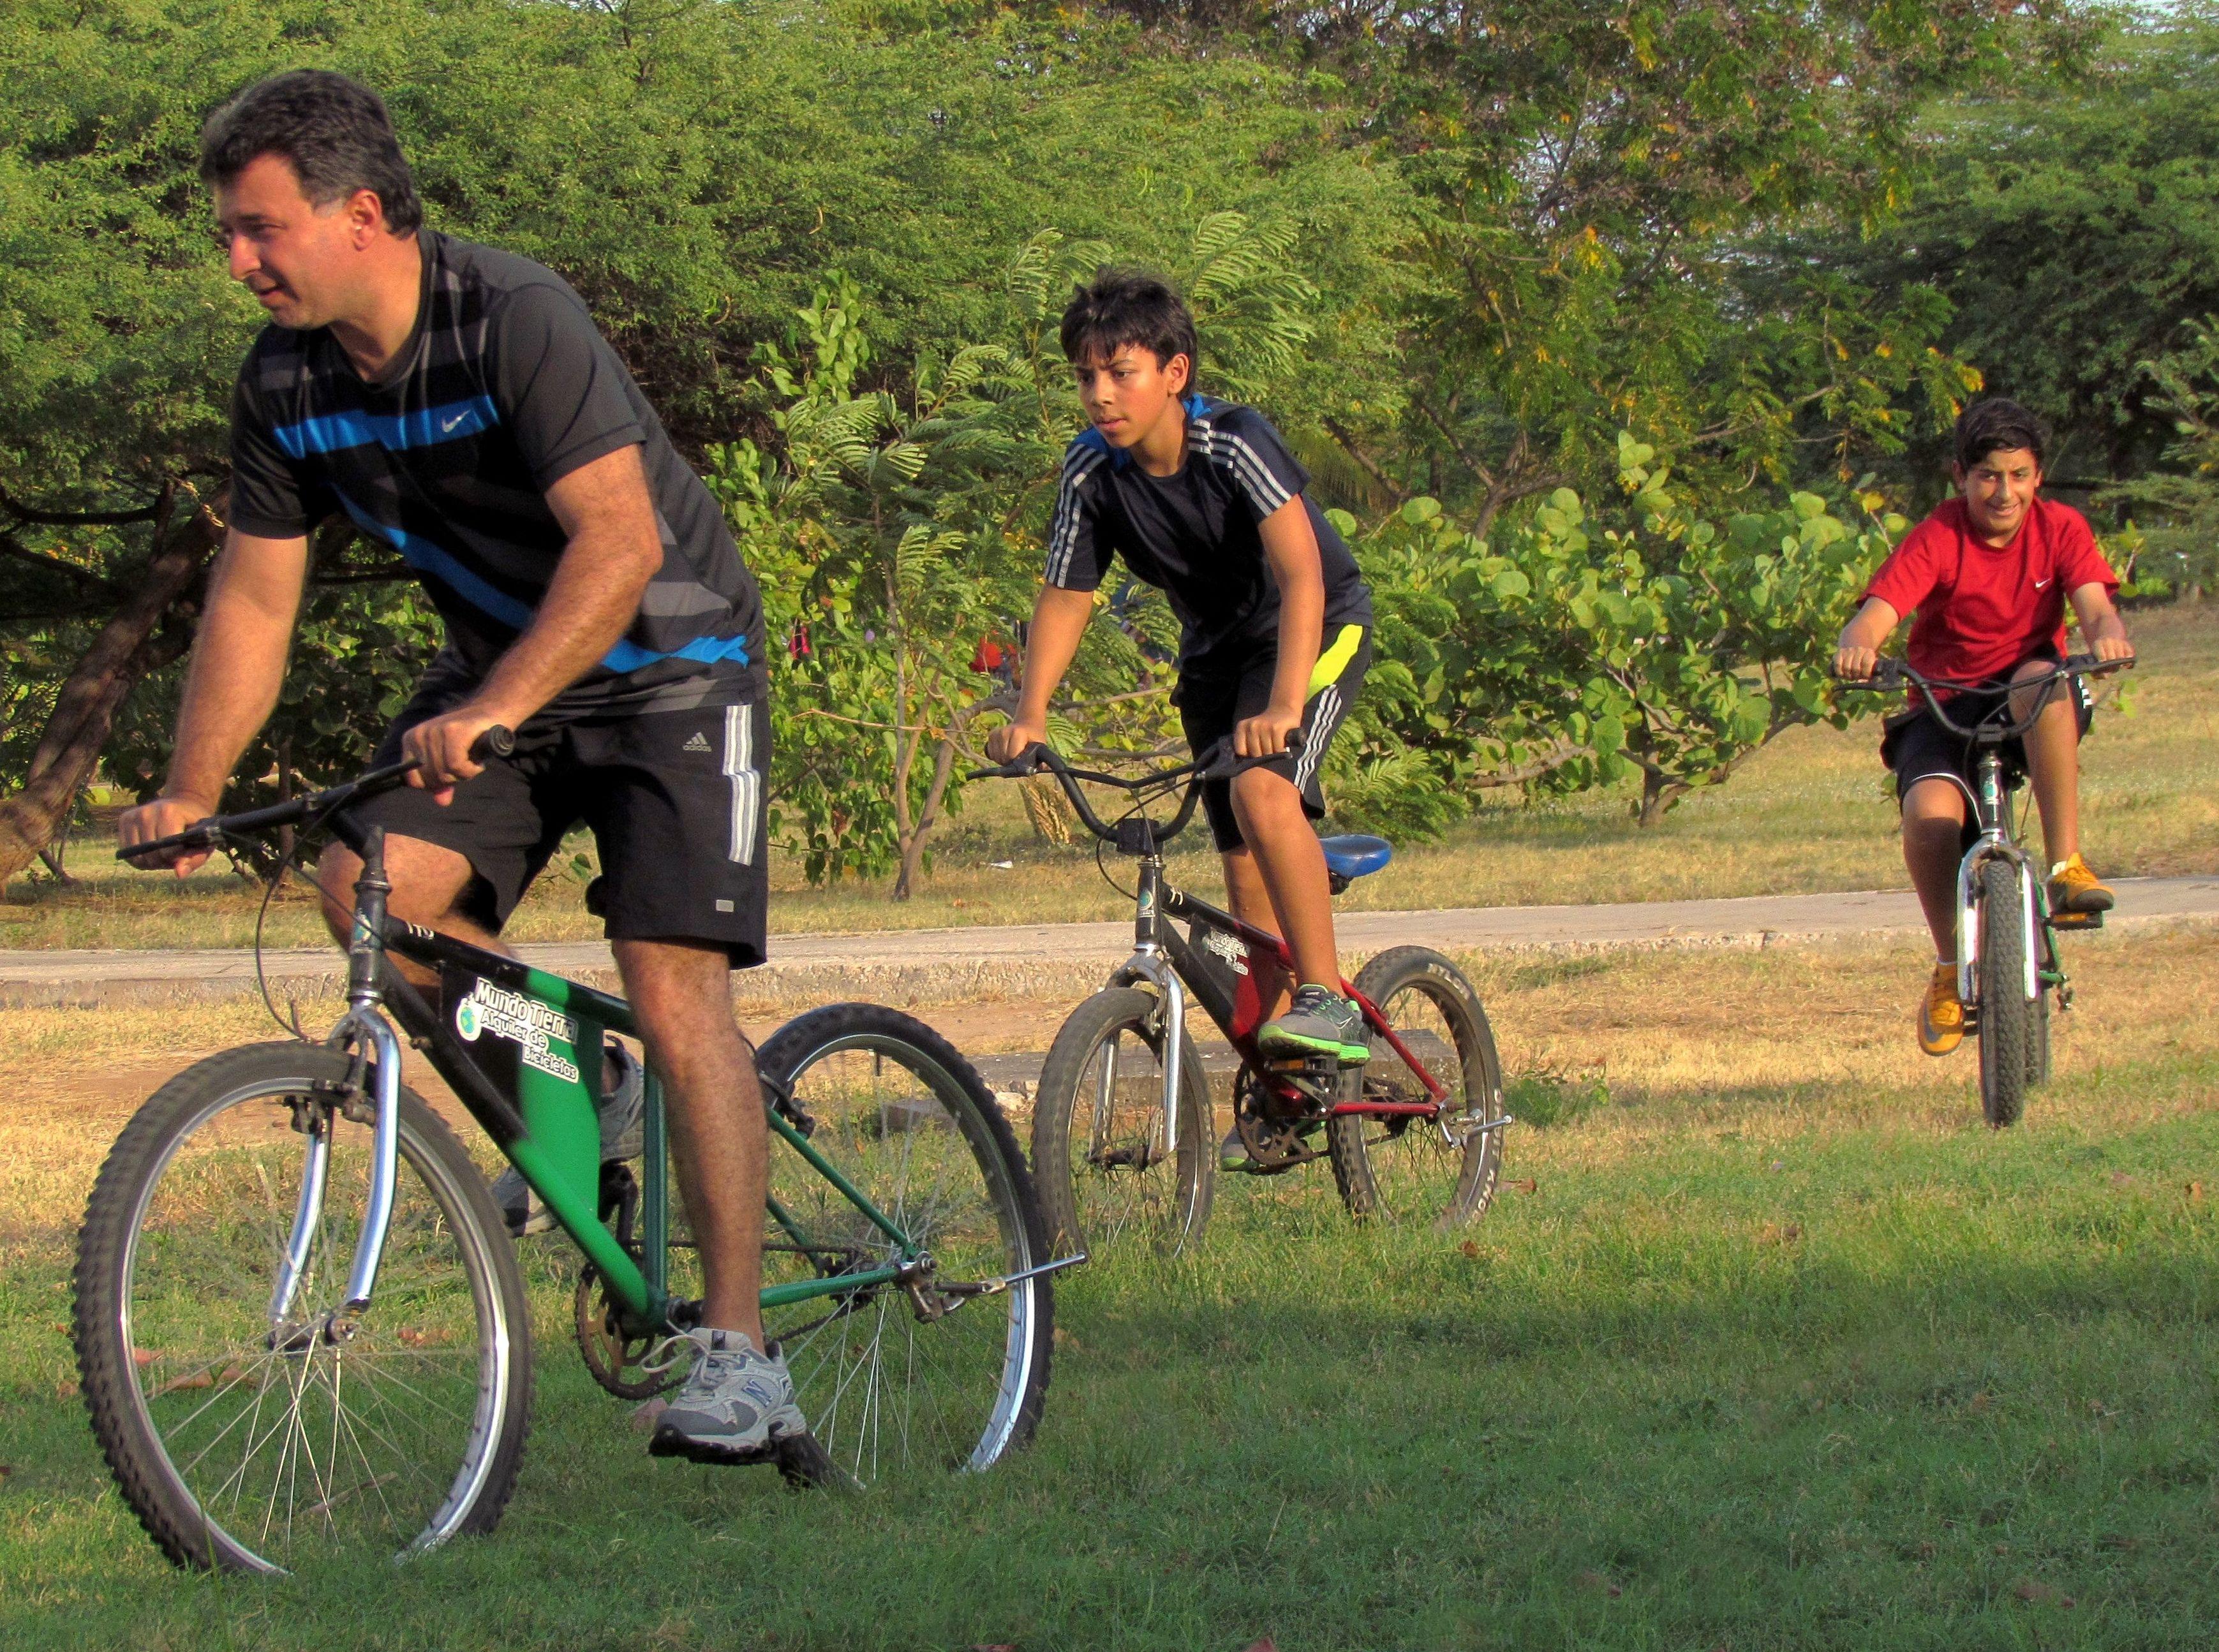 Seguros para bicicletas: Servicios  de Amado Correduría de Seguros